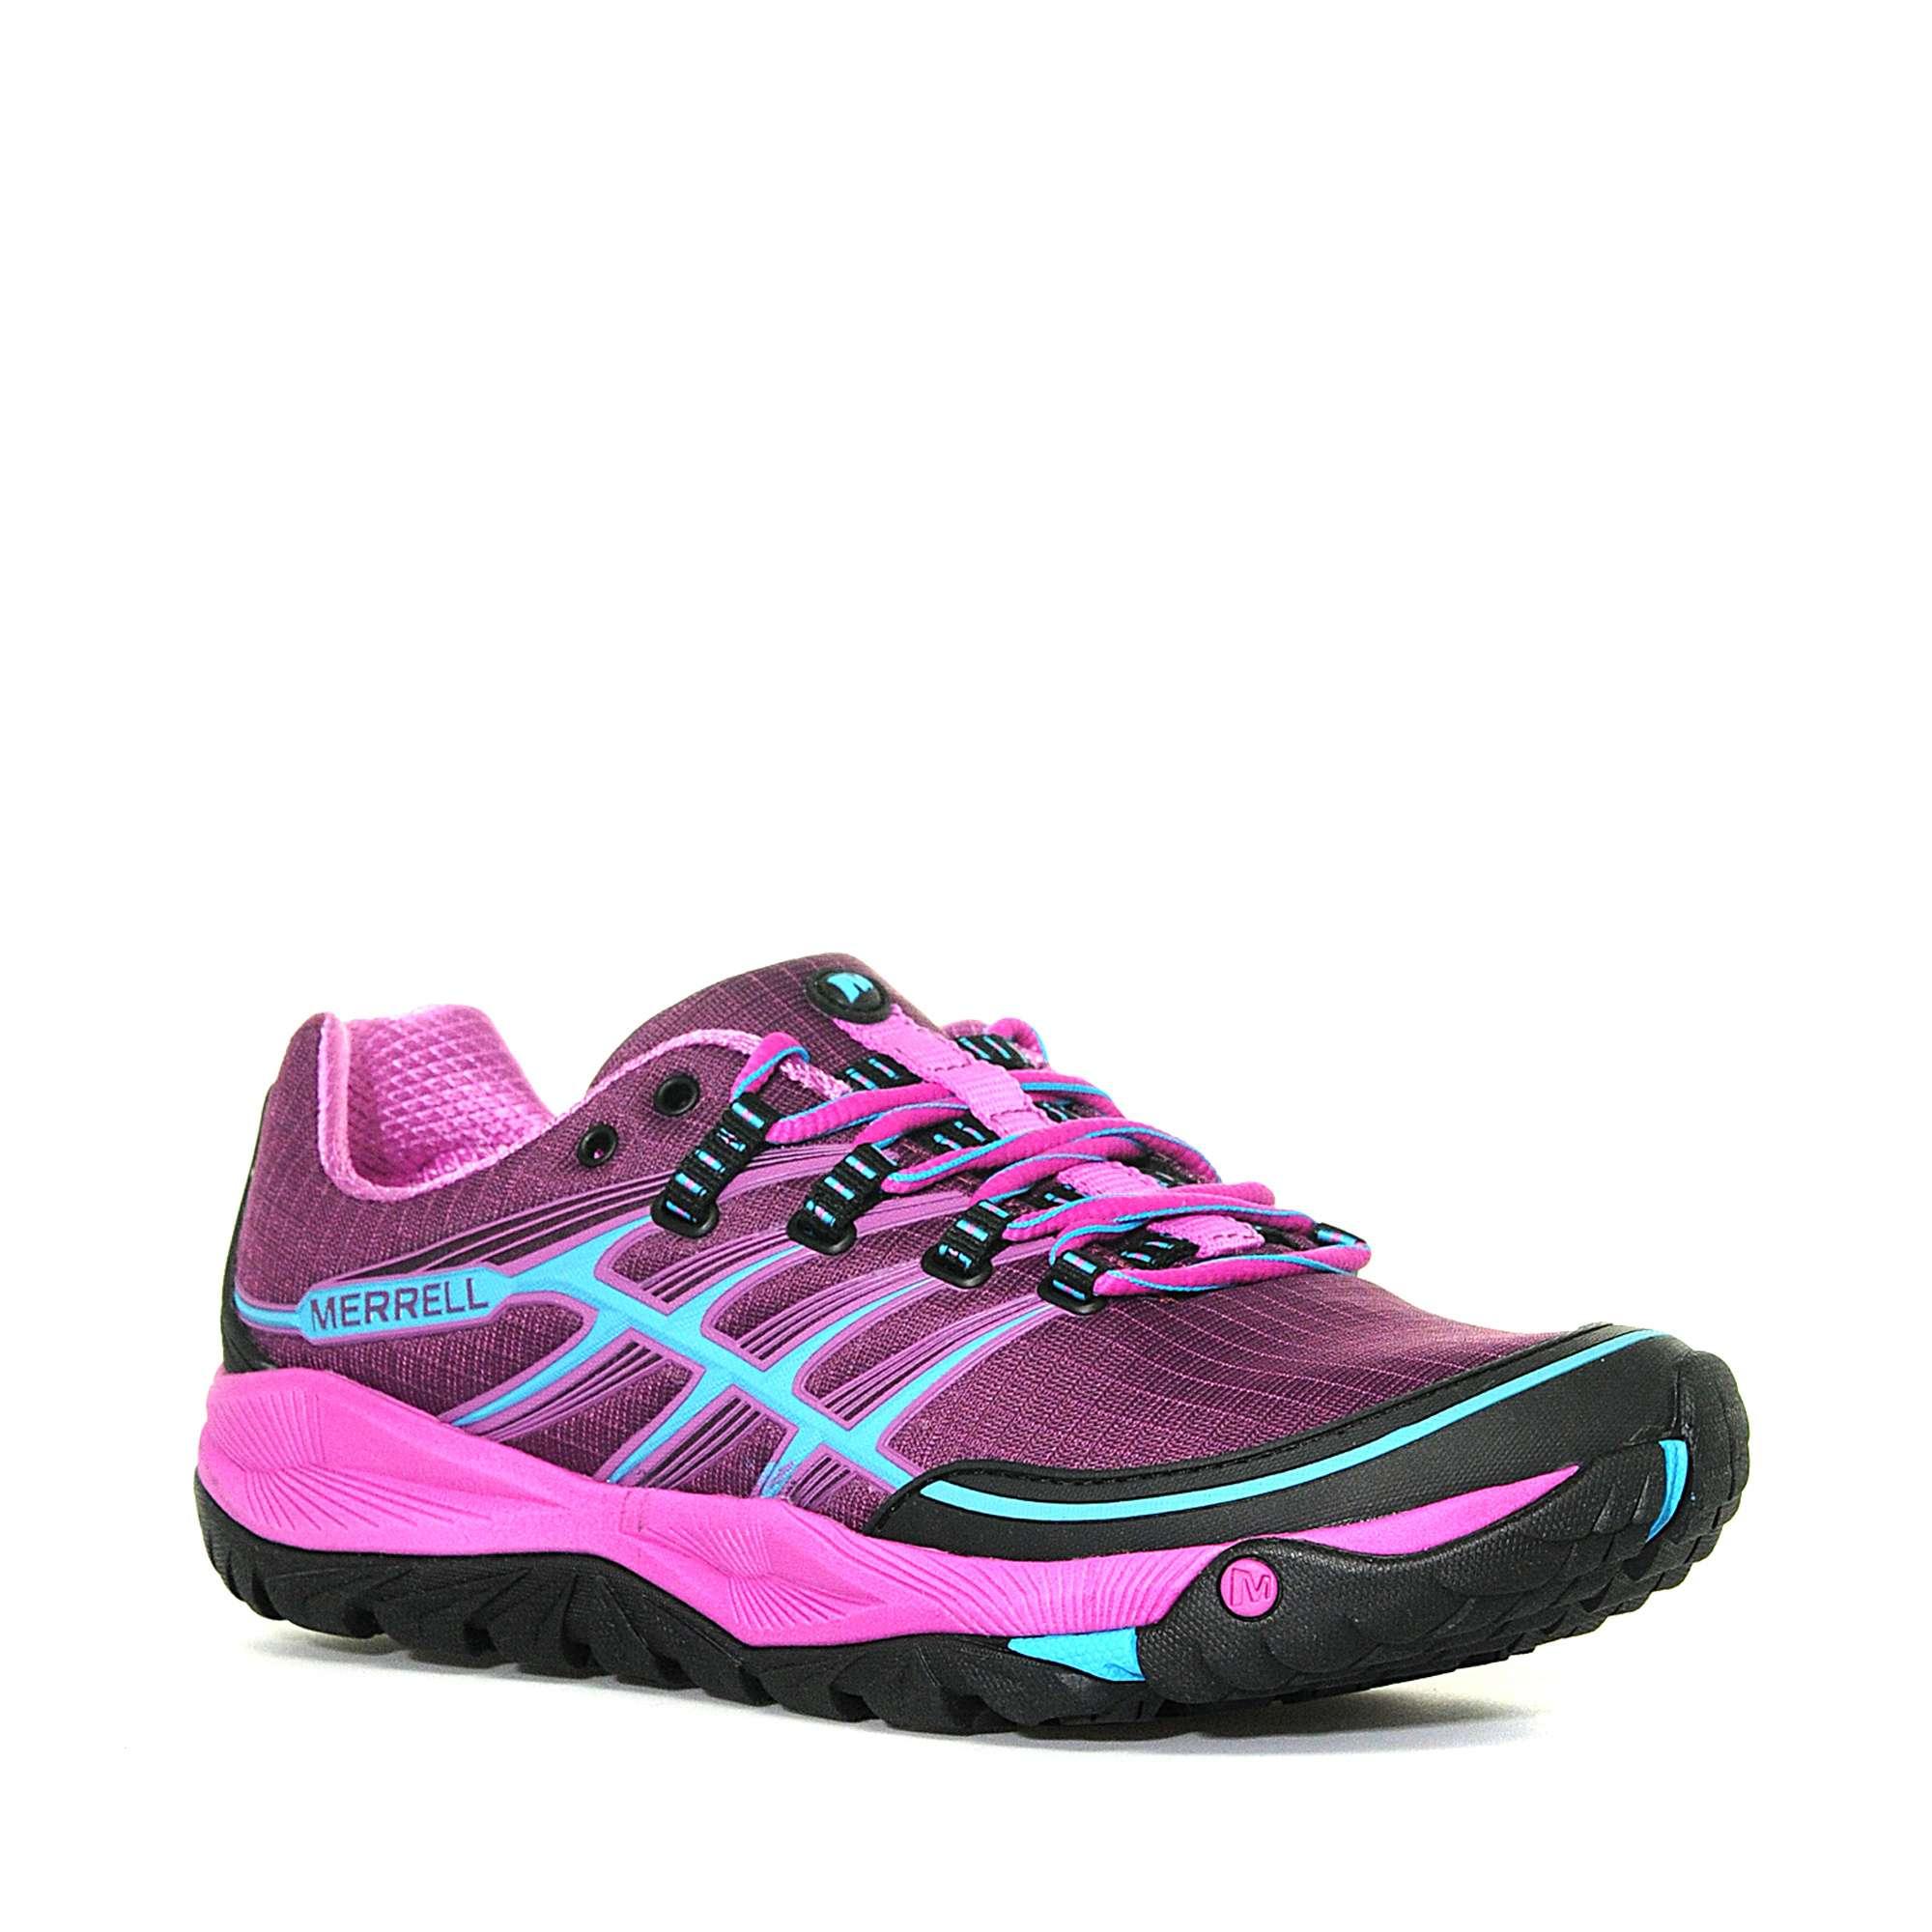 MERRELL Women's All-Out Rush Trail Running Shoe